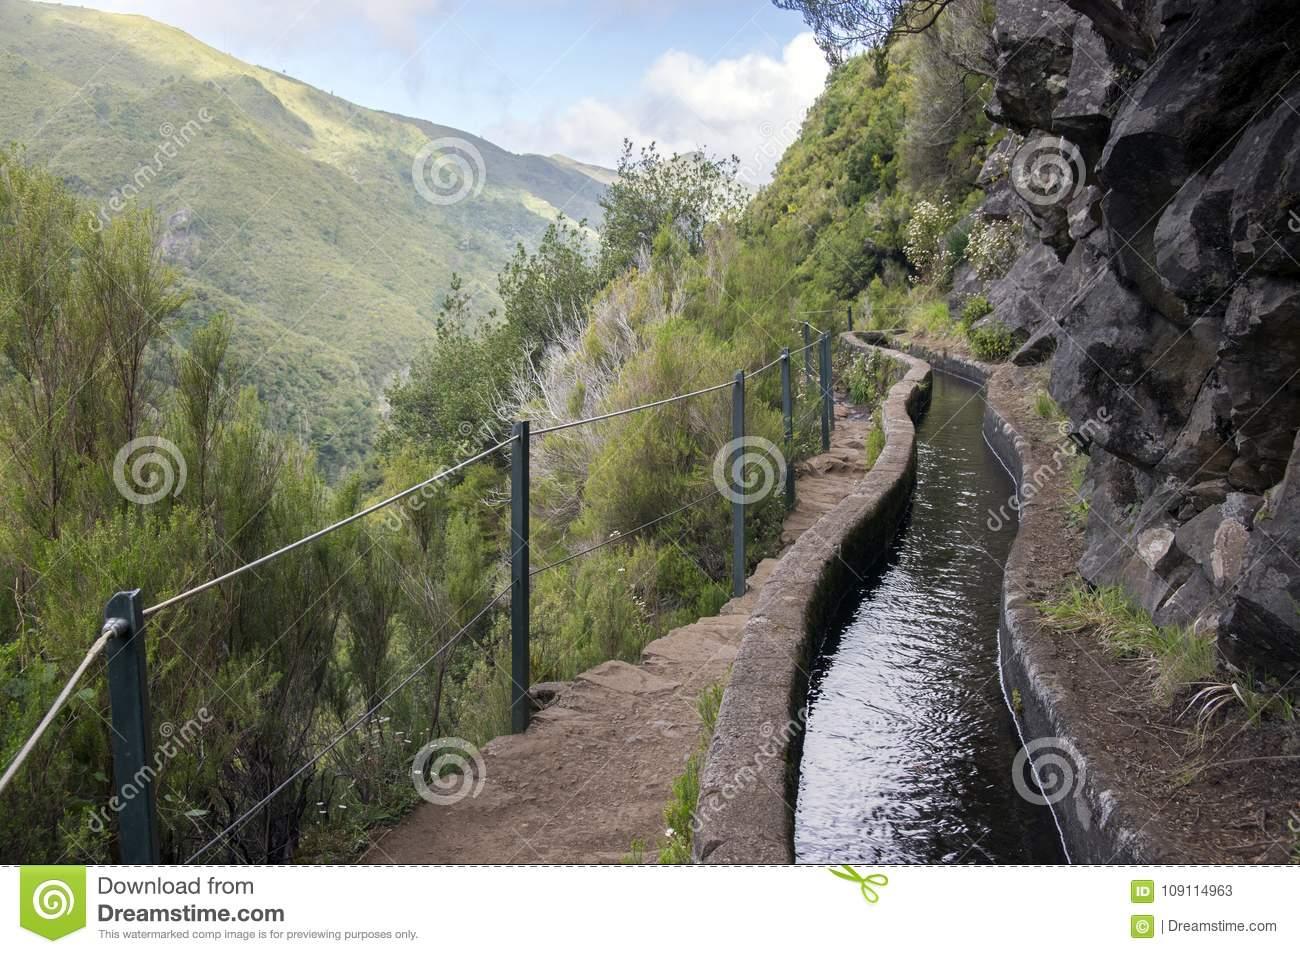 Levada Das 25 Fontes, Touristic Hiking Trail, Rabacal, Madeira.